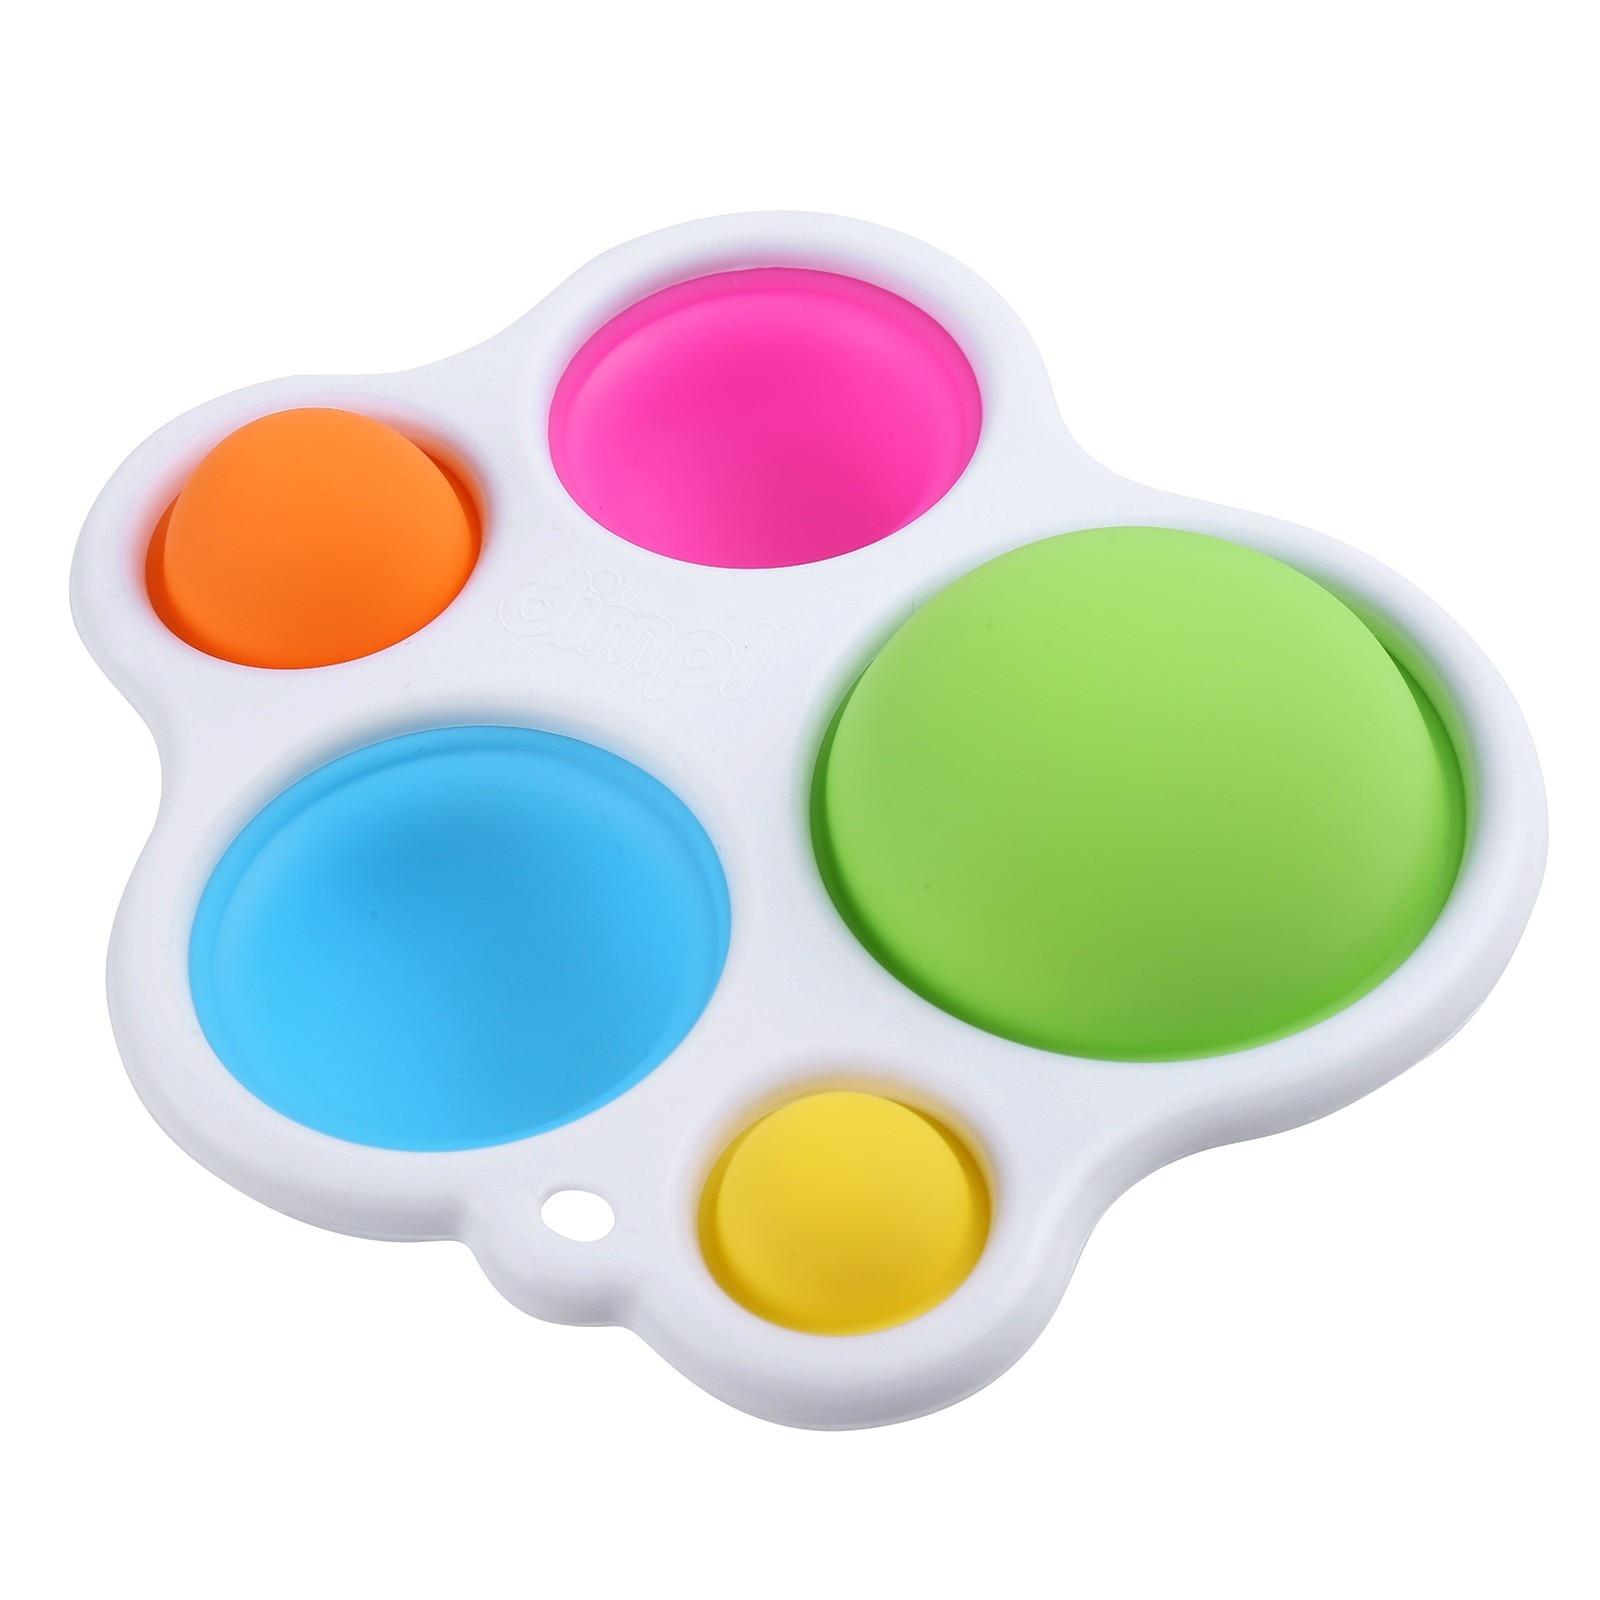 Training-Toys Fidget-Sensory-Toys Intelligence-Development ADULTES Reliver Decompression